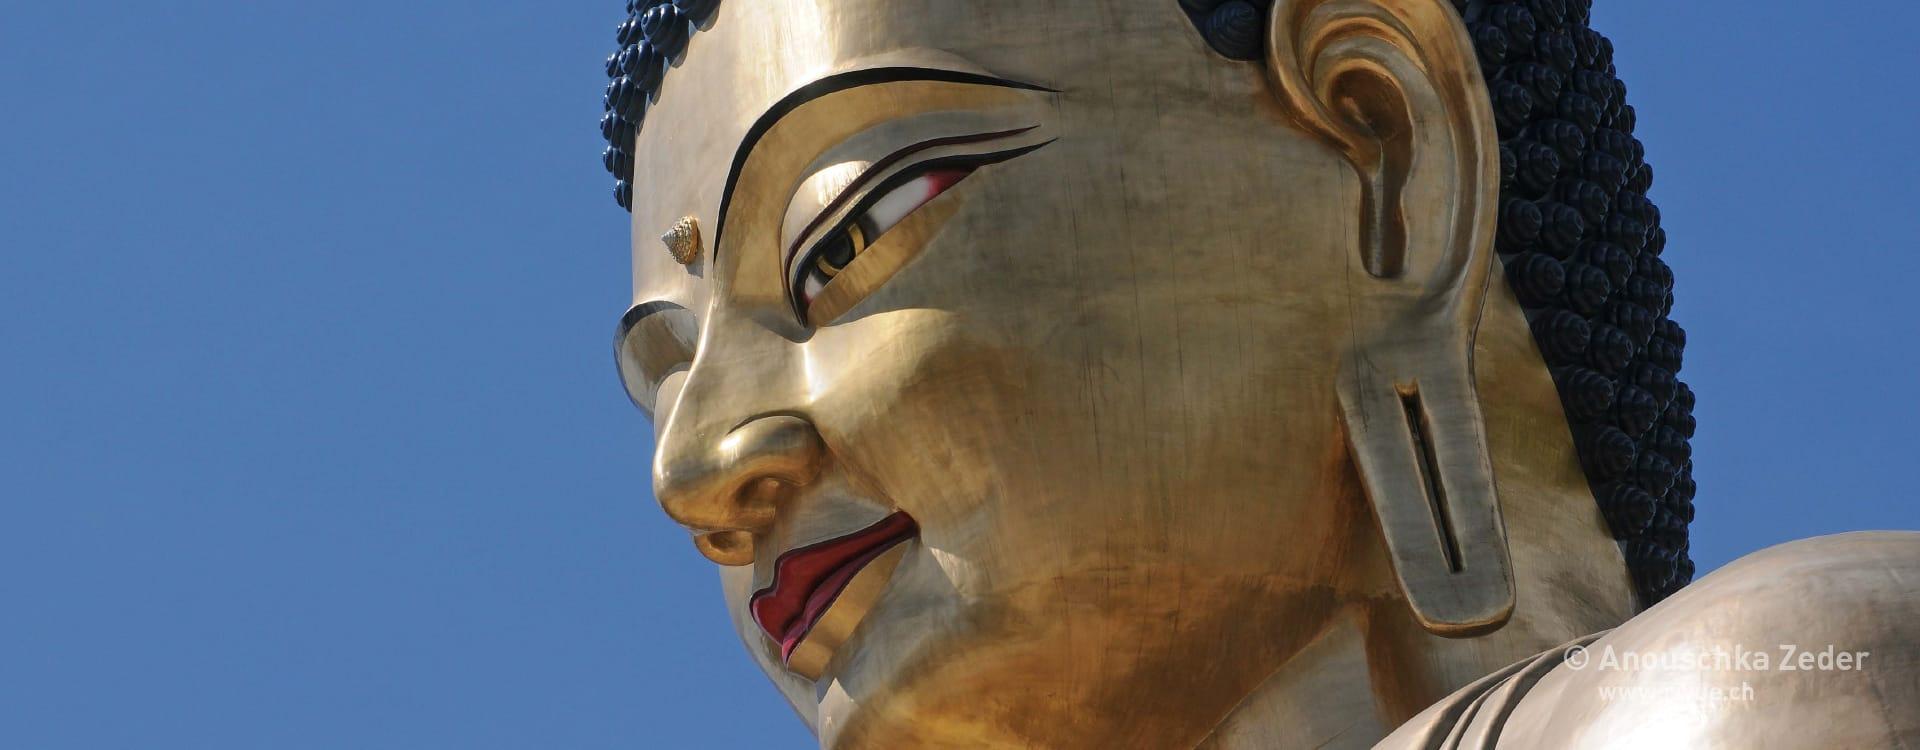 riyue – Zungendiagnose – Buddha Bhutan